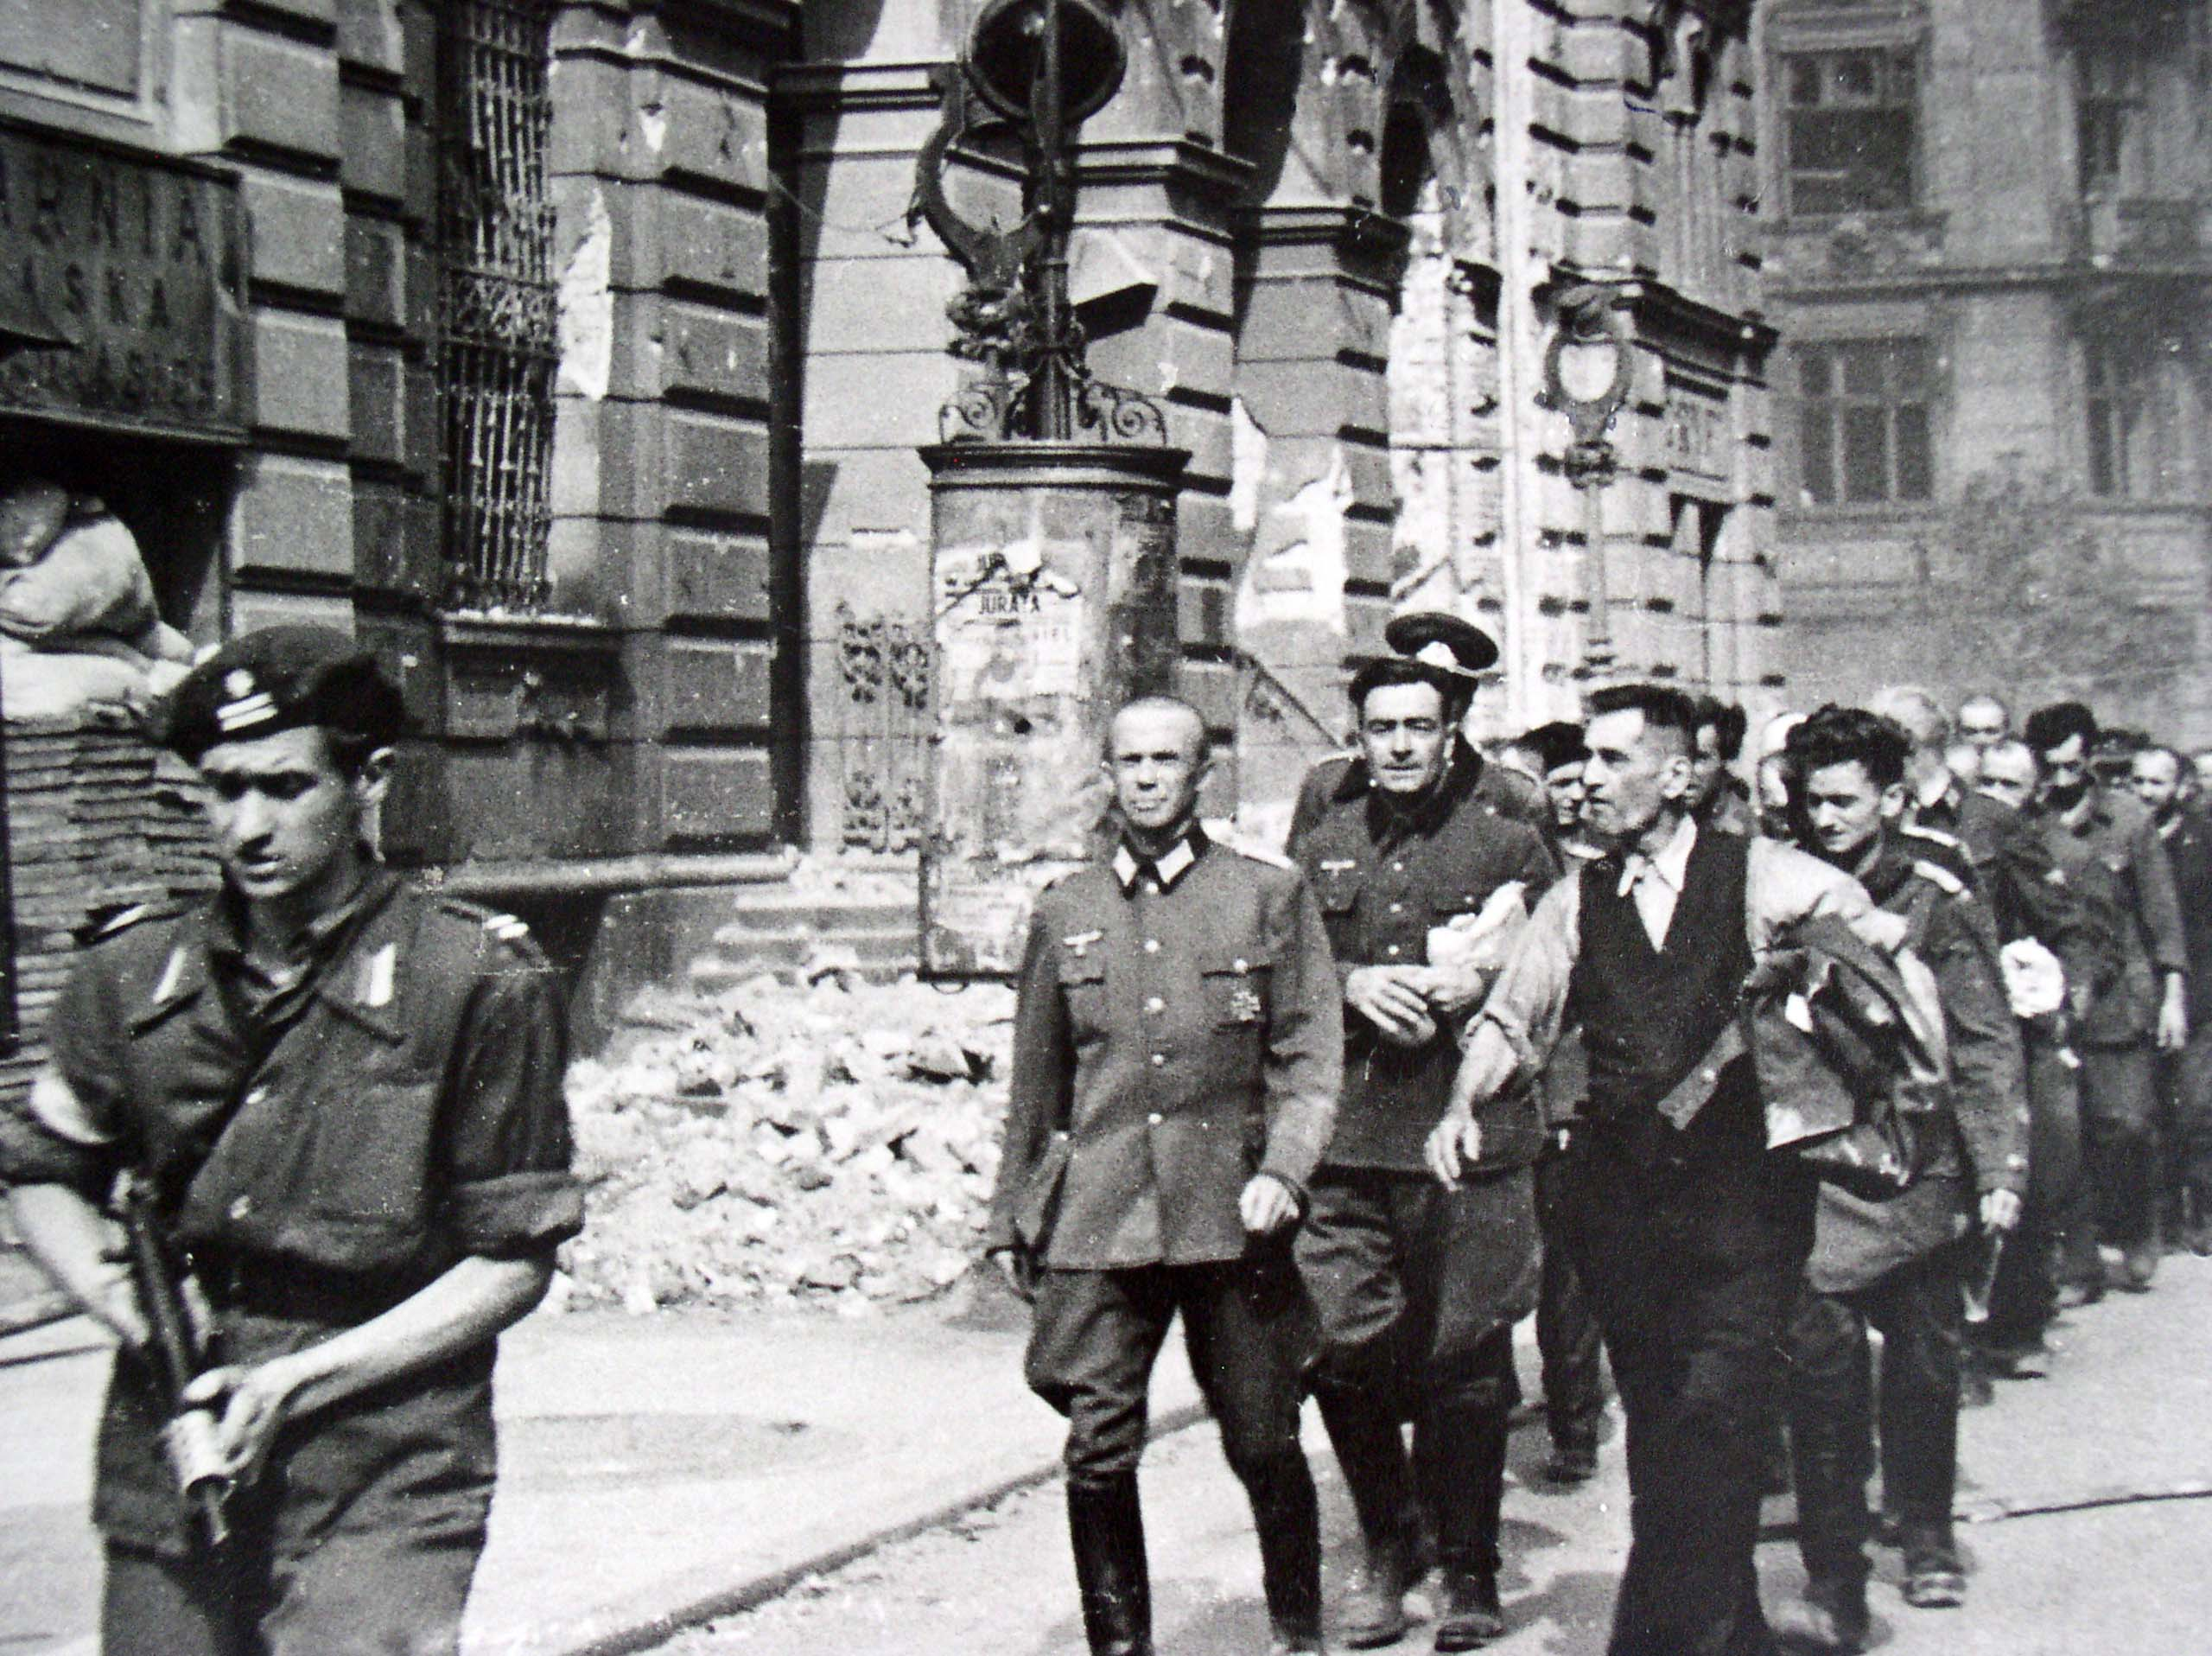 German prisoners of war, Warsaw rebels